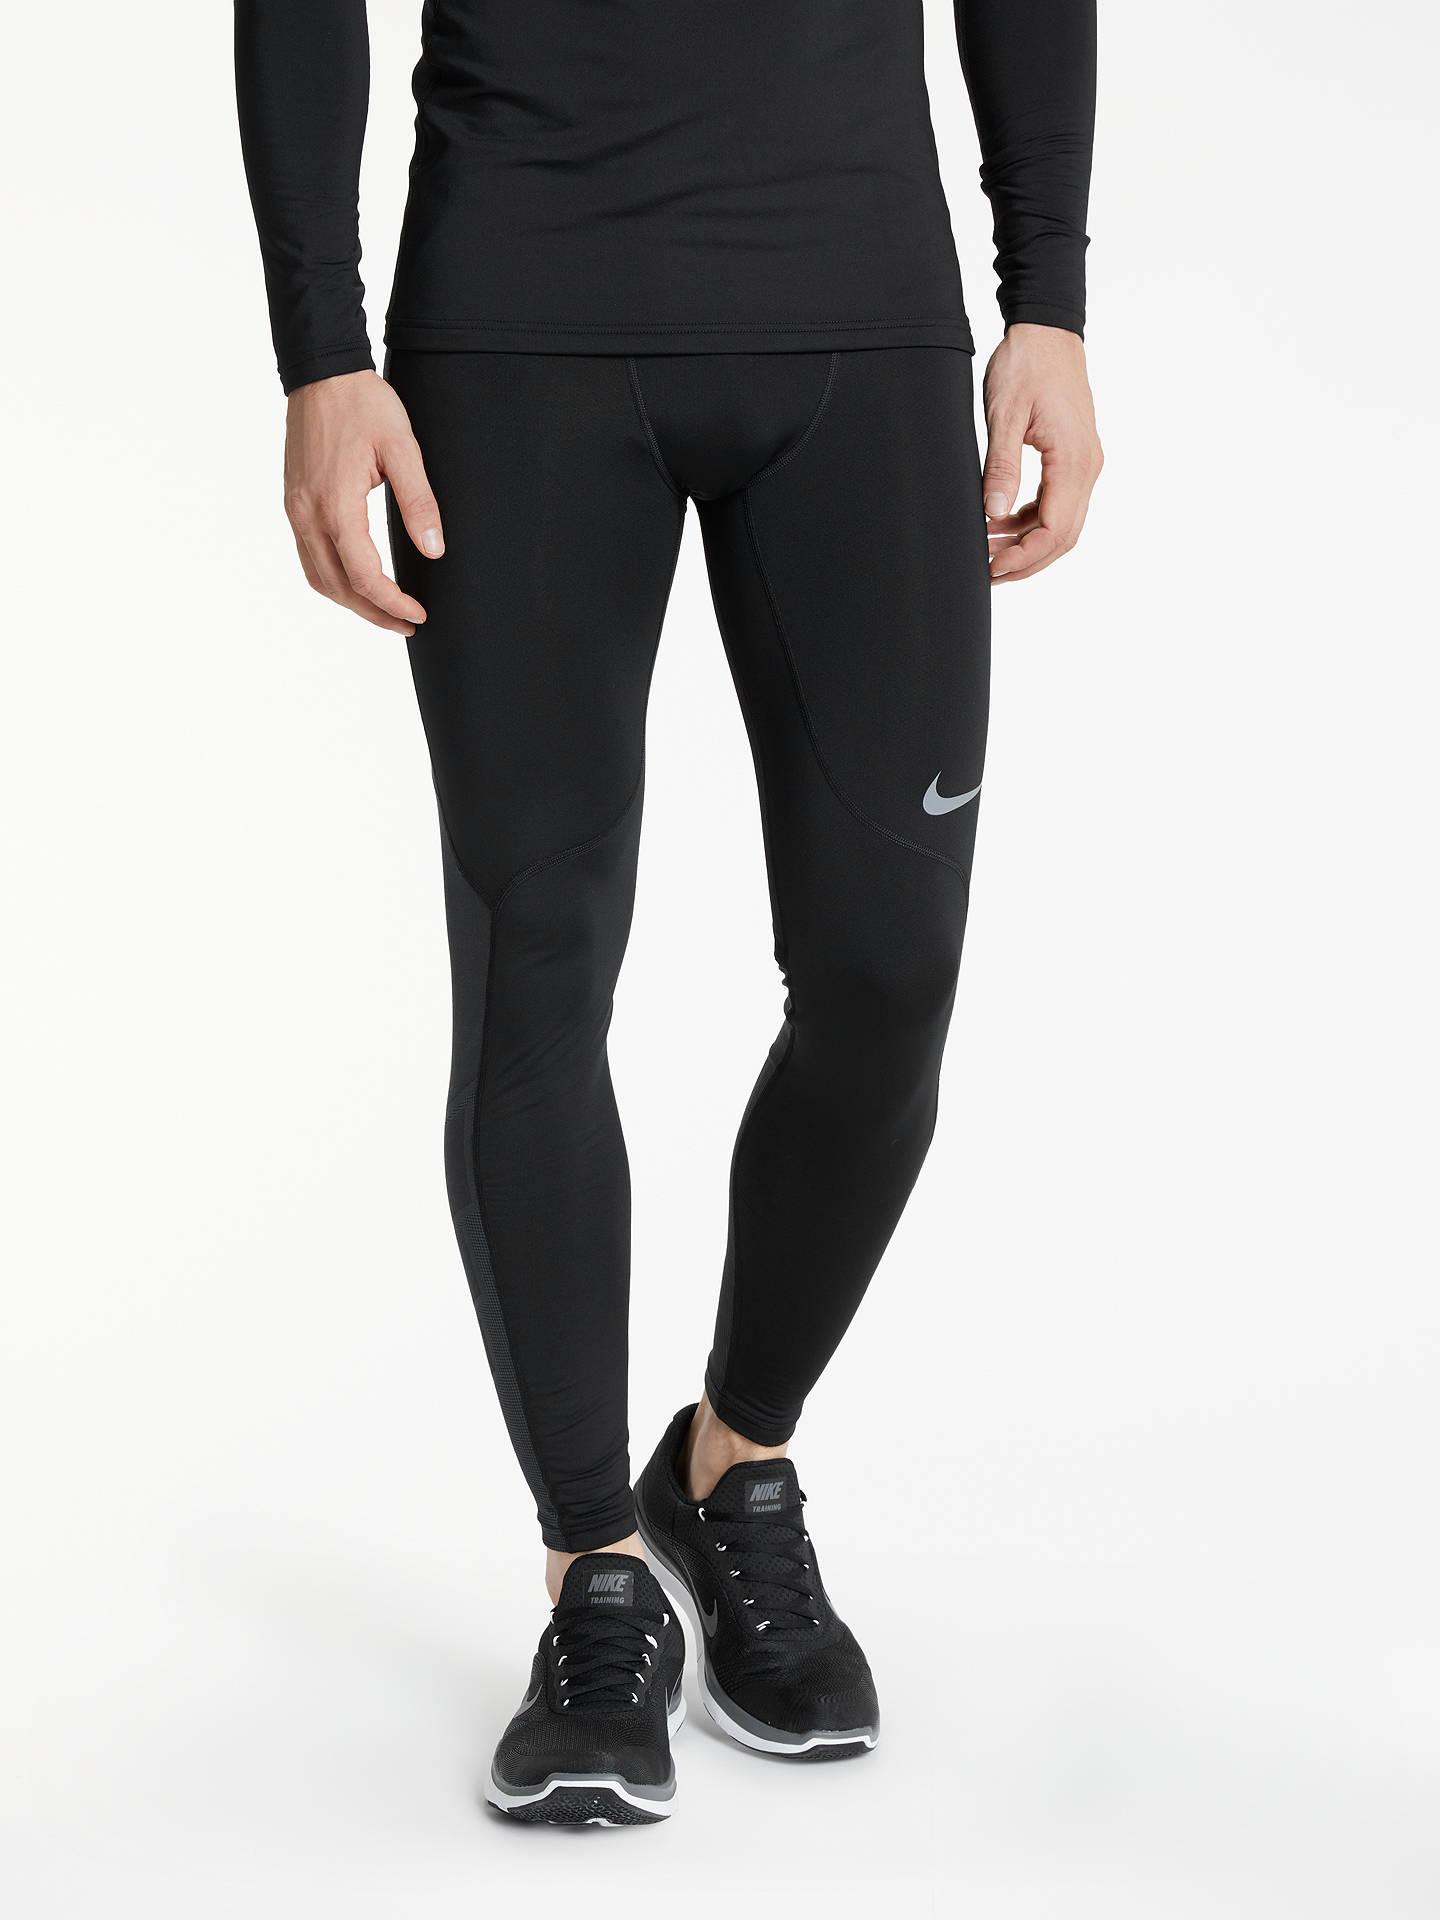 4f2815dbd7f75d Buy Nike Pro Hyperwarm Training Tights, Black/Cool Grey, S Online at  johnlewis ...